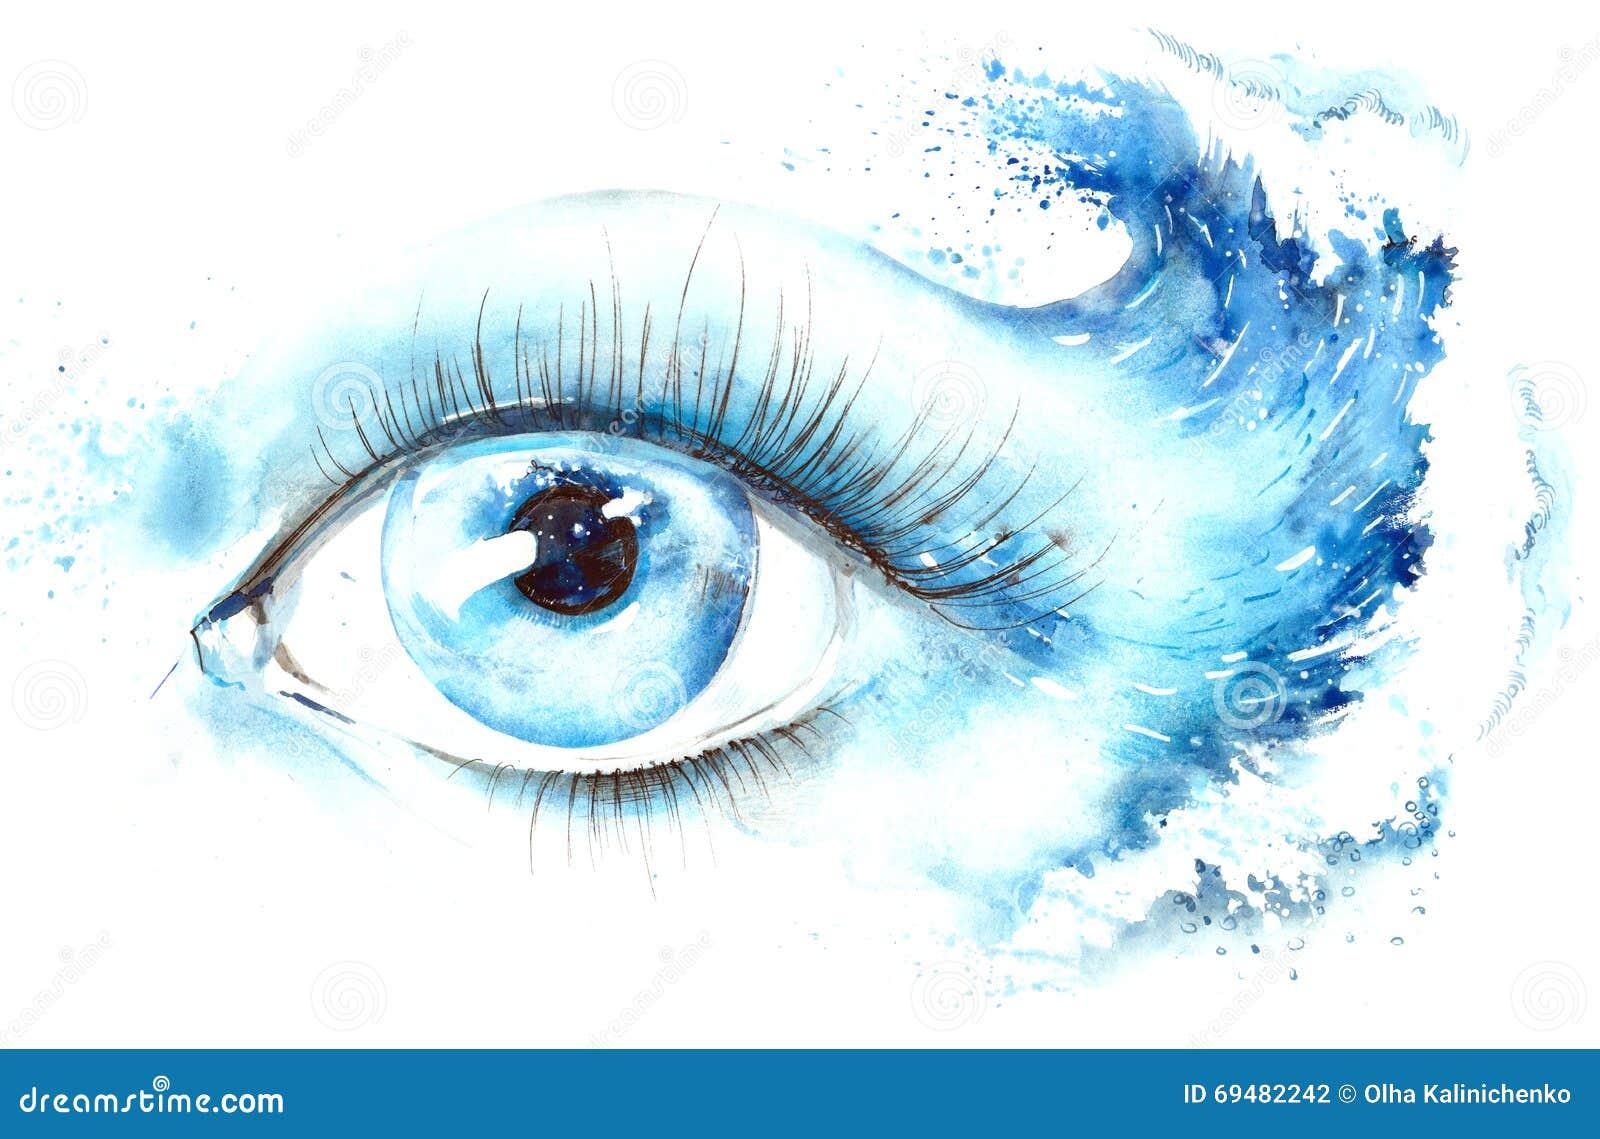 Eye In The Sea